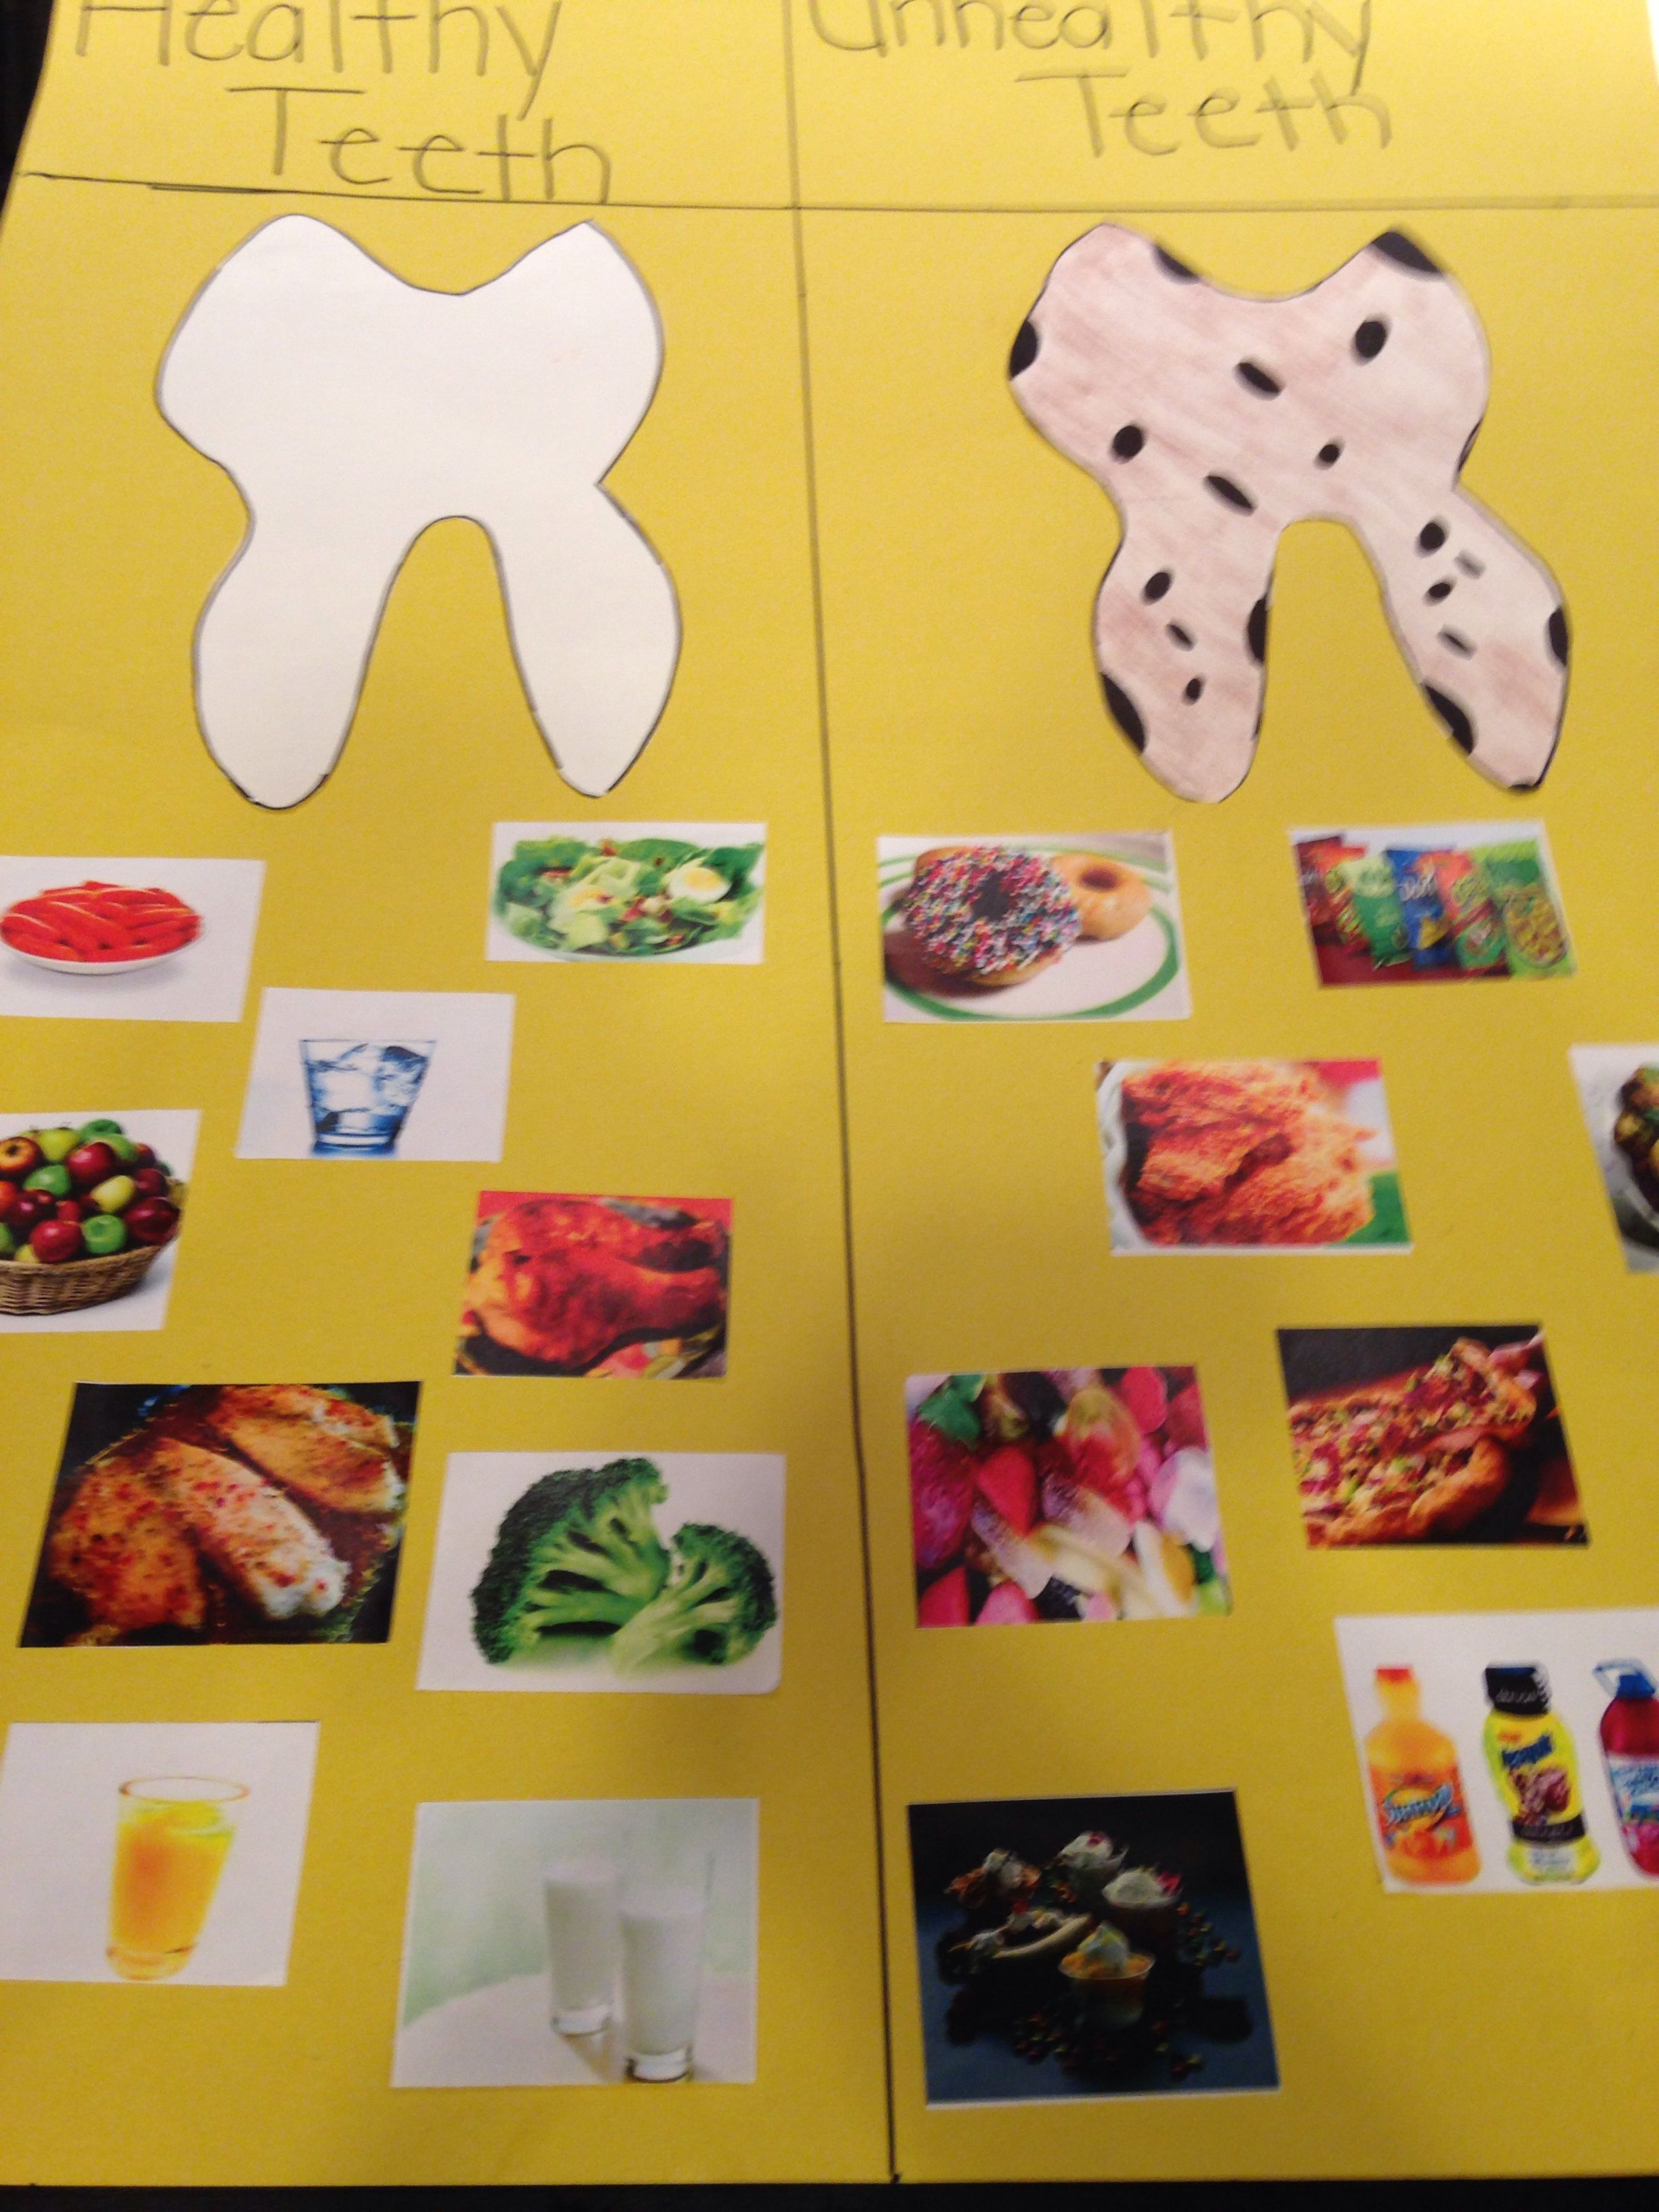 Healthy Teeth Versus Unhealthy Teeth I Made This Poster